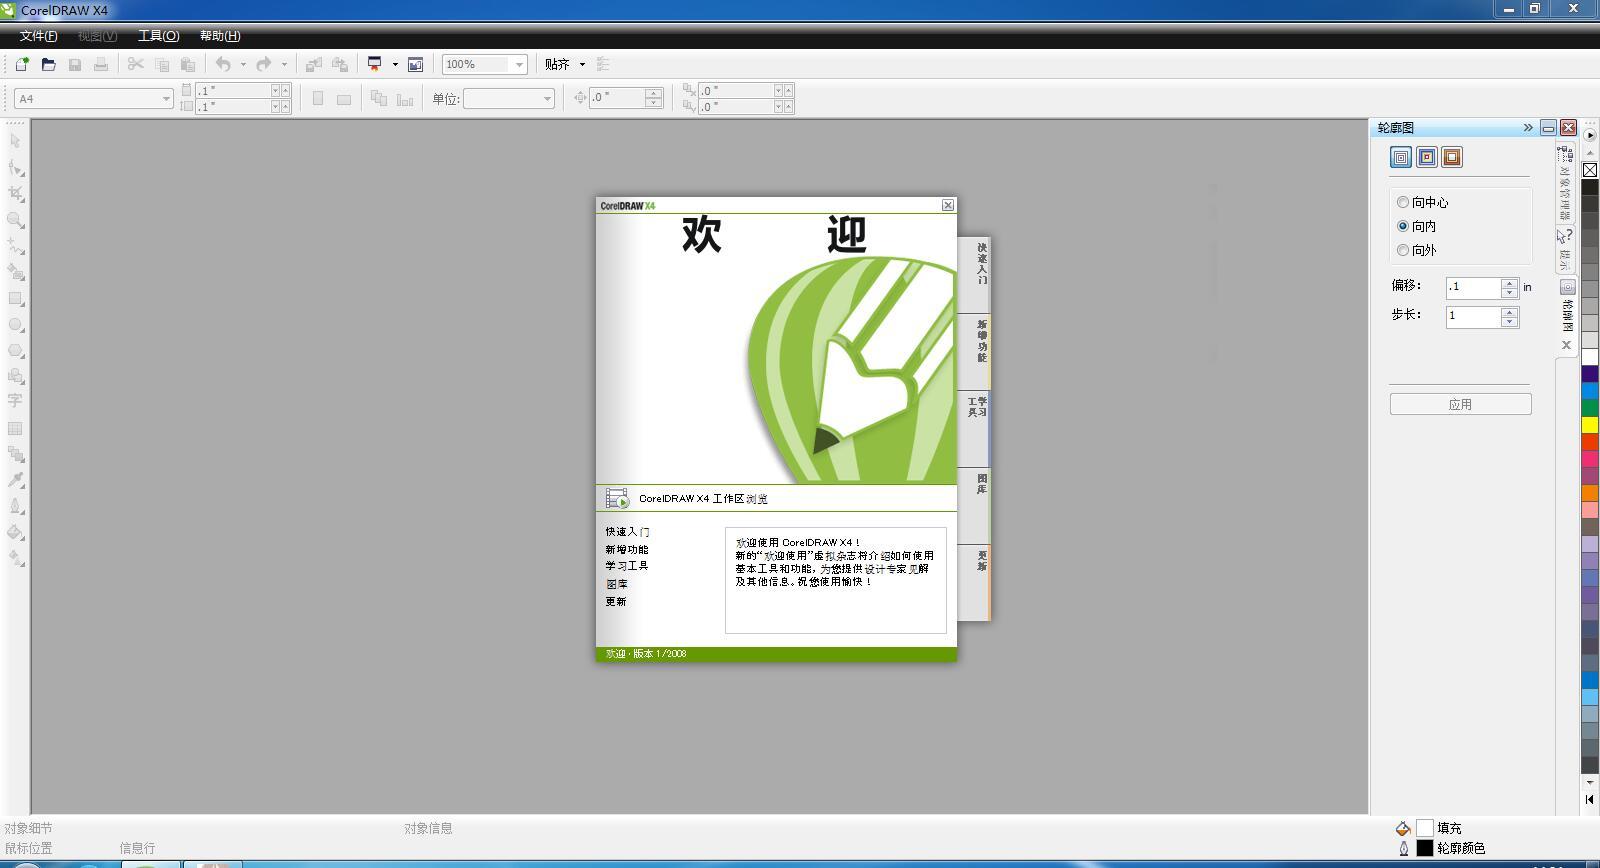 CorelDRAW X4 x32截图4